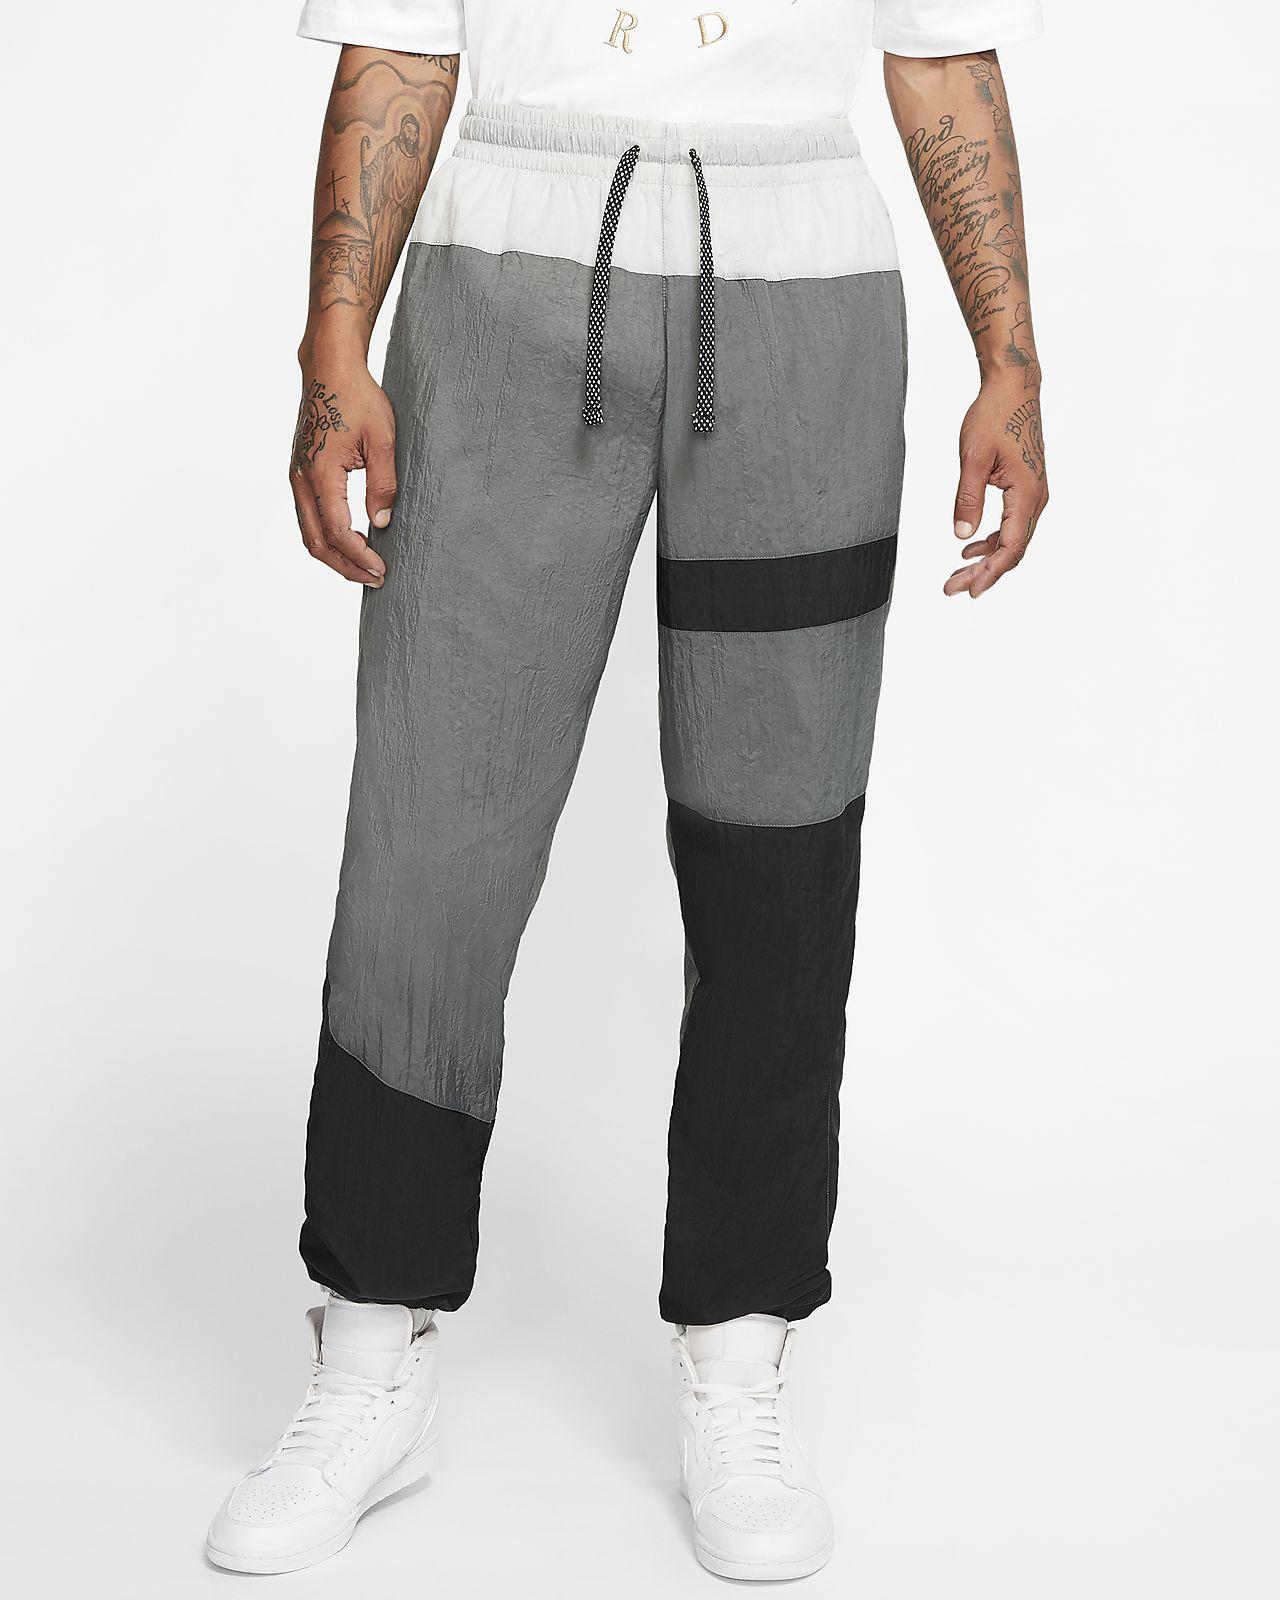 Nike Flight Basketball Pants